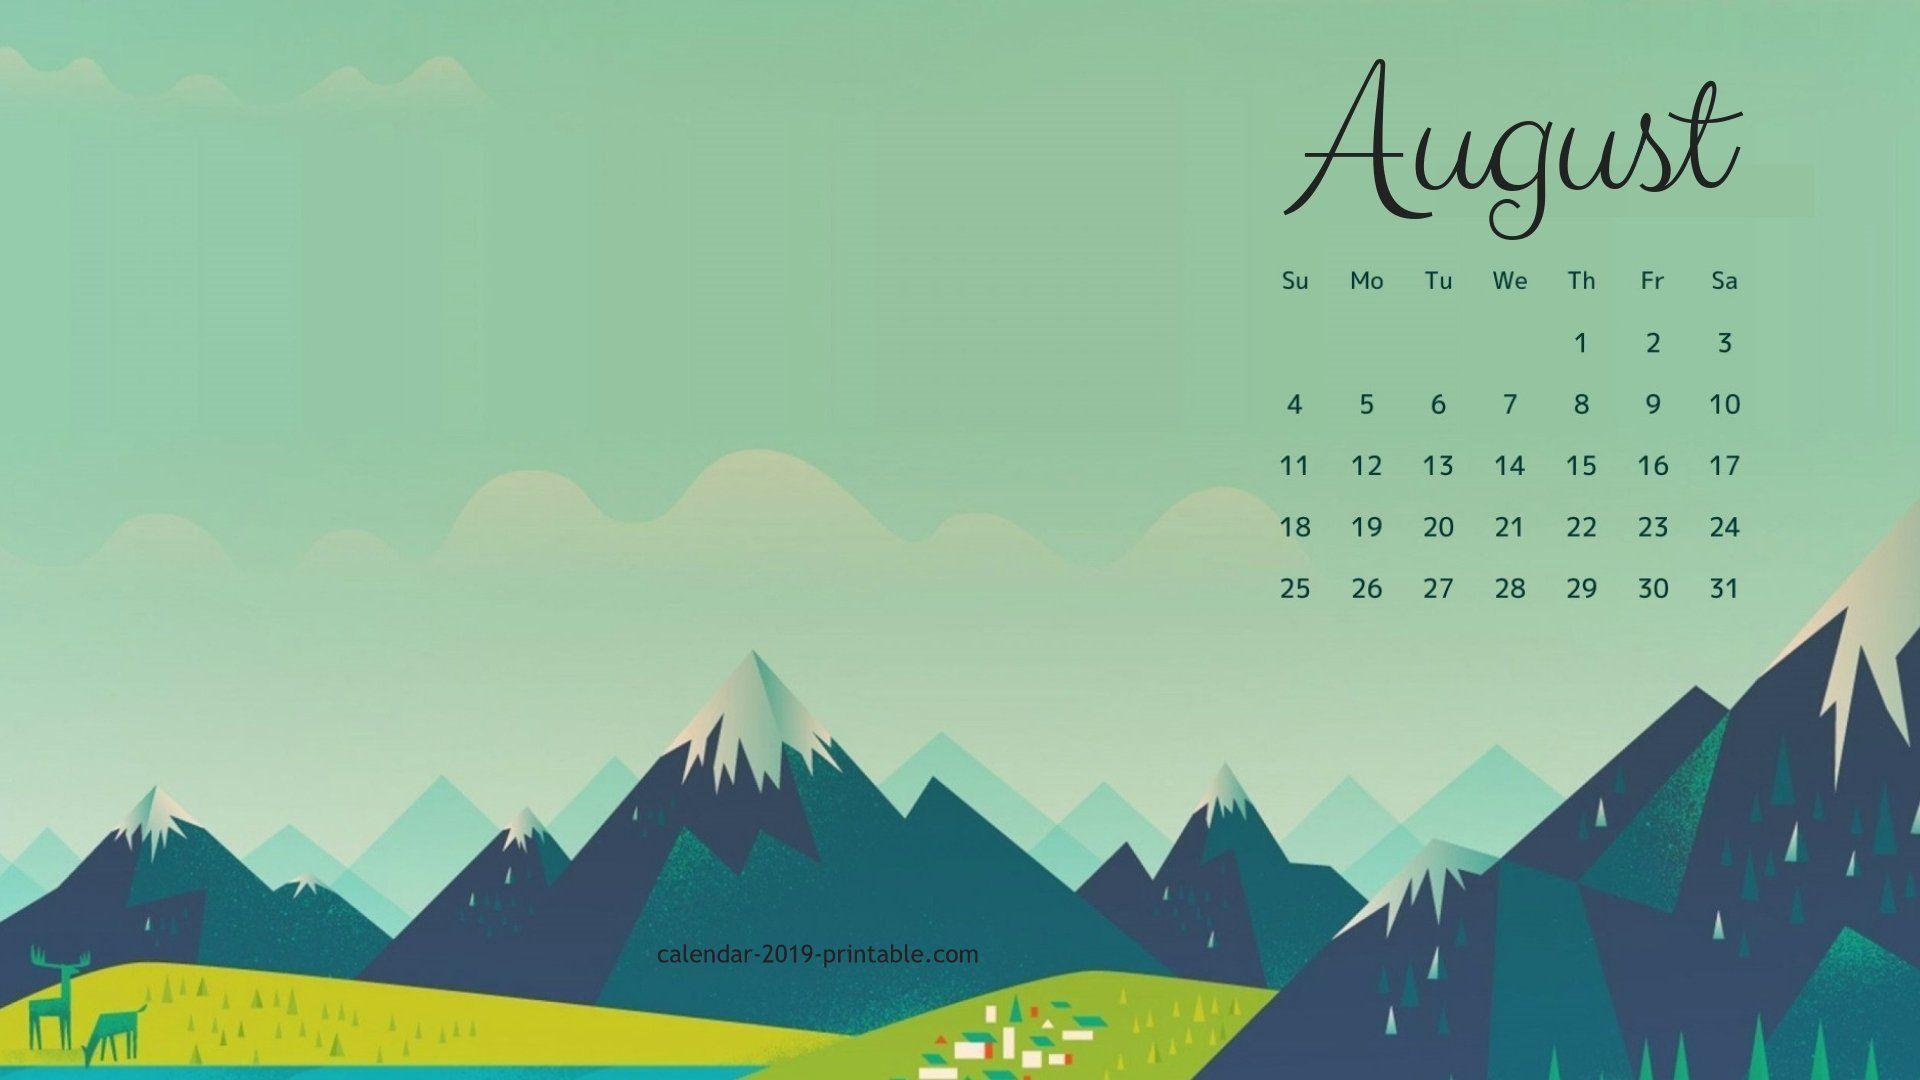 Calendar Wallpapers For August 2019 Pc Hintergrundbilder Hintergrundbilder Bilder